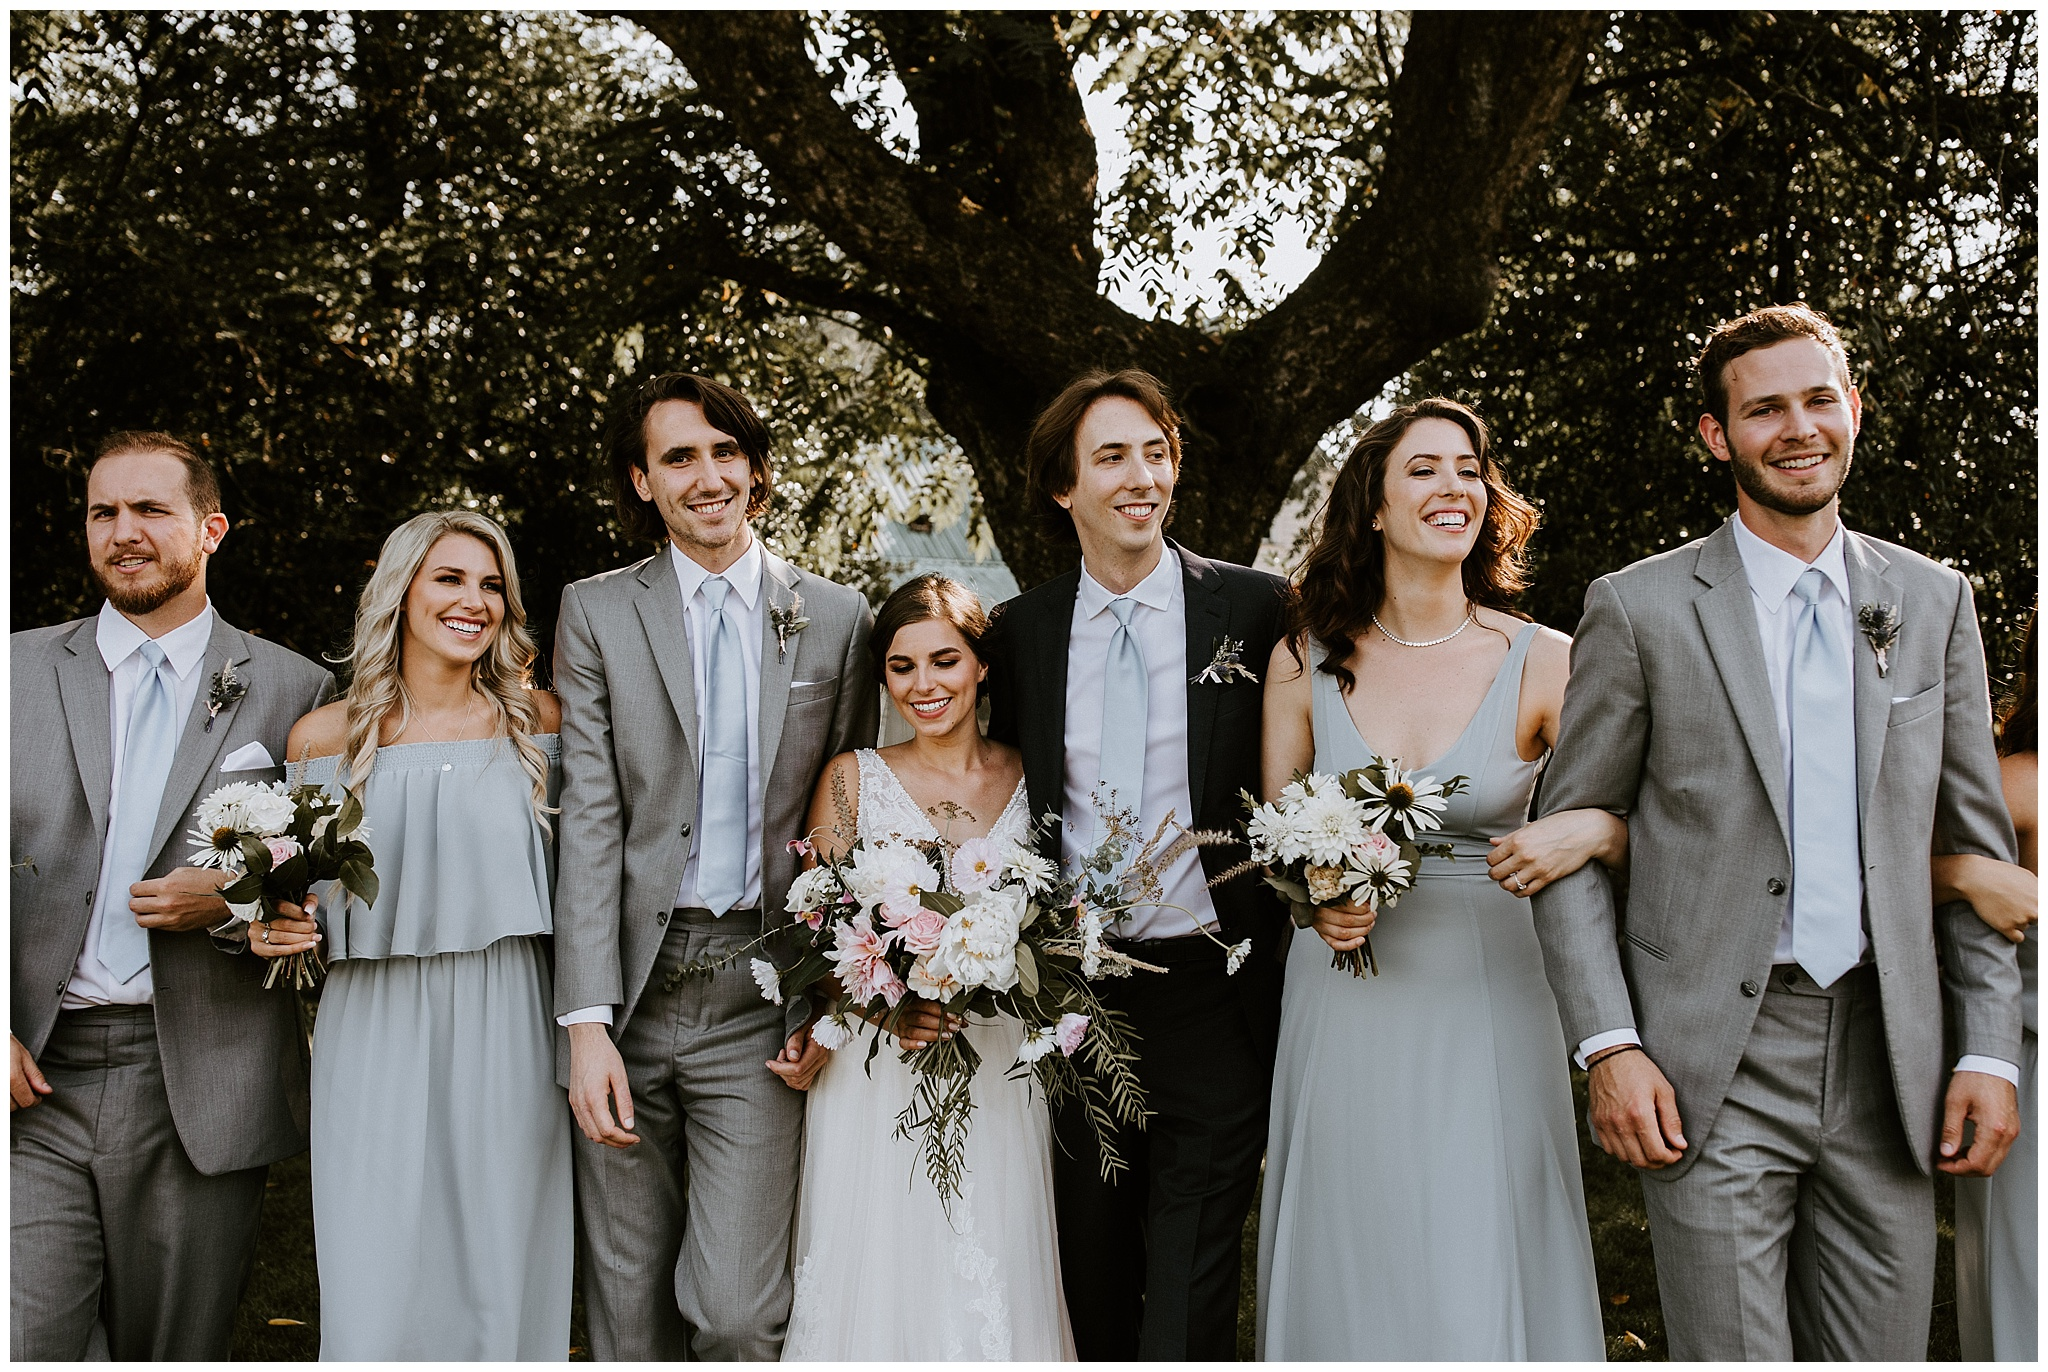 estate-248-wedding-langley-034.JPG